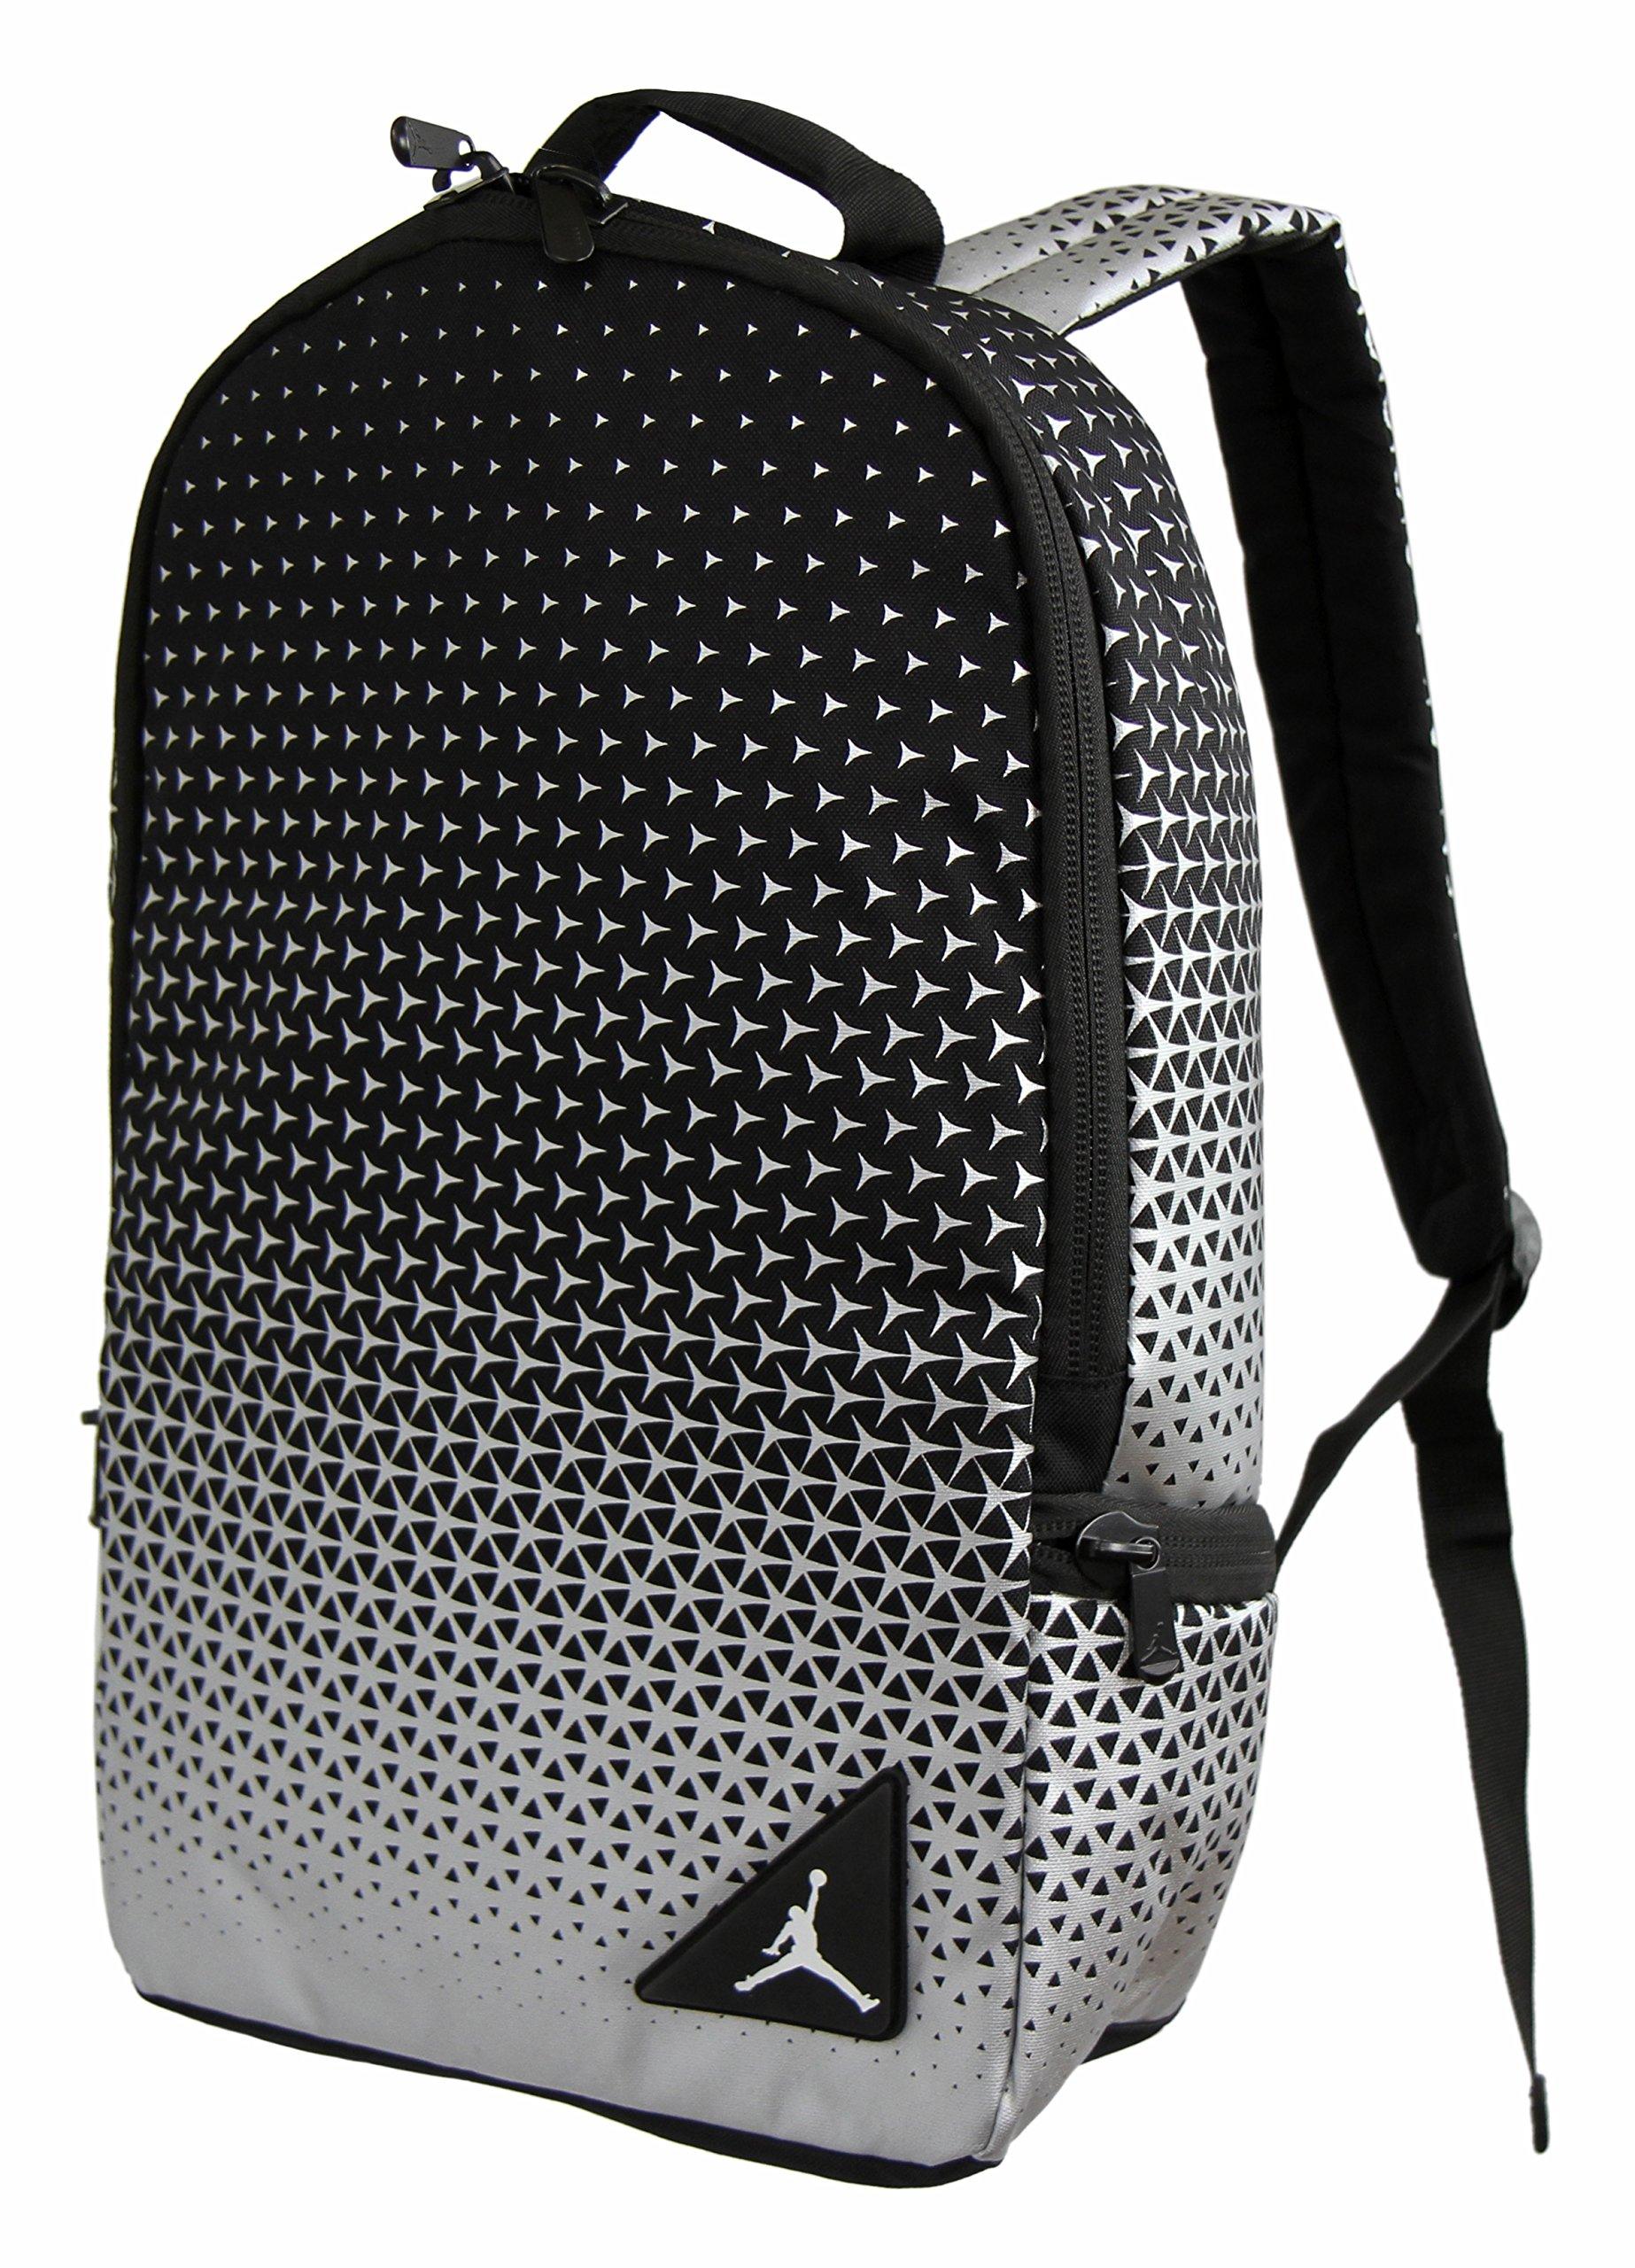 Nike Jordan Boys Backpack - Black, Silver